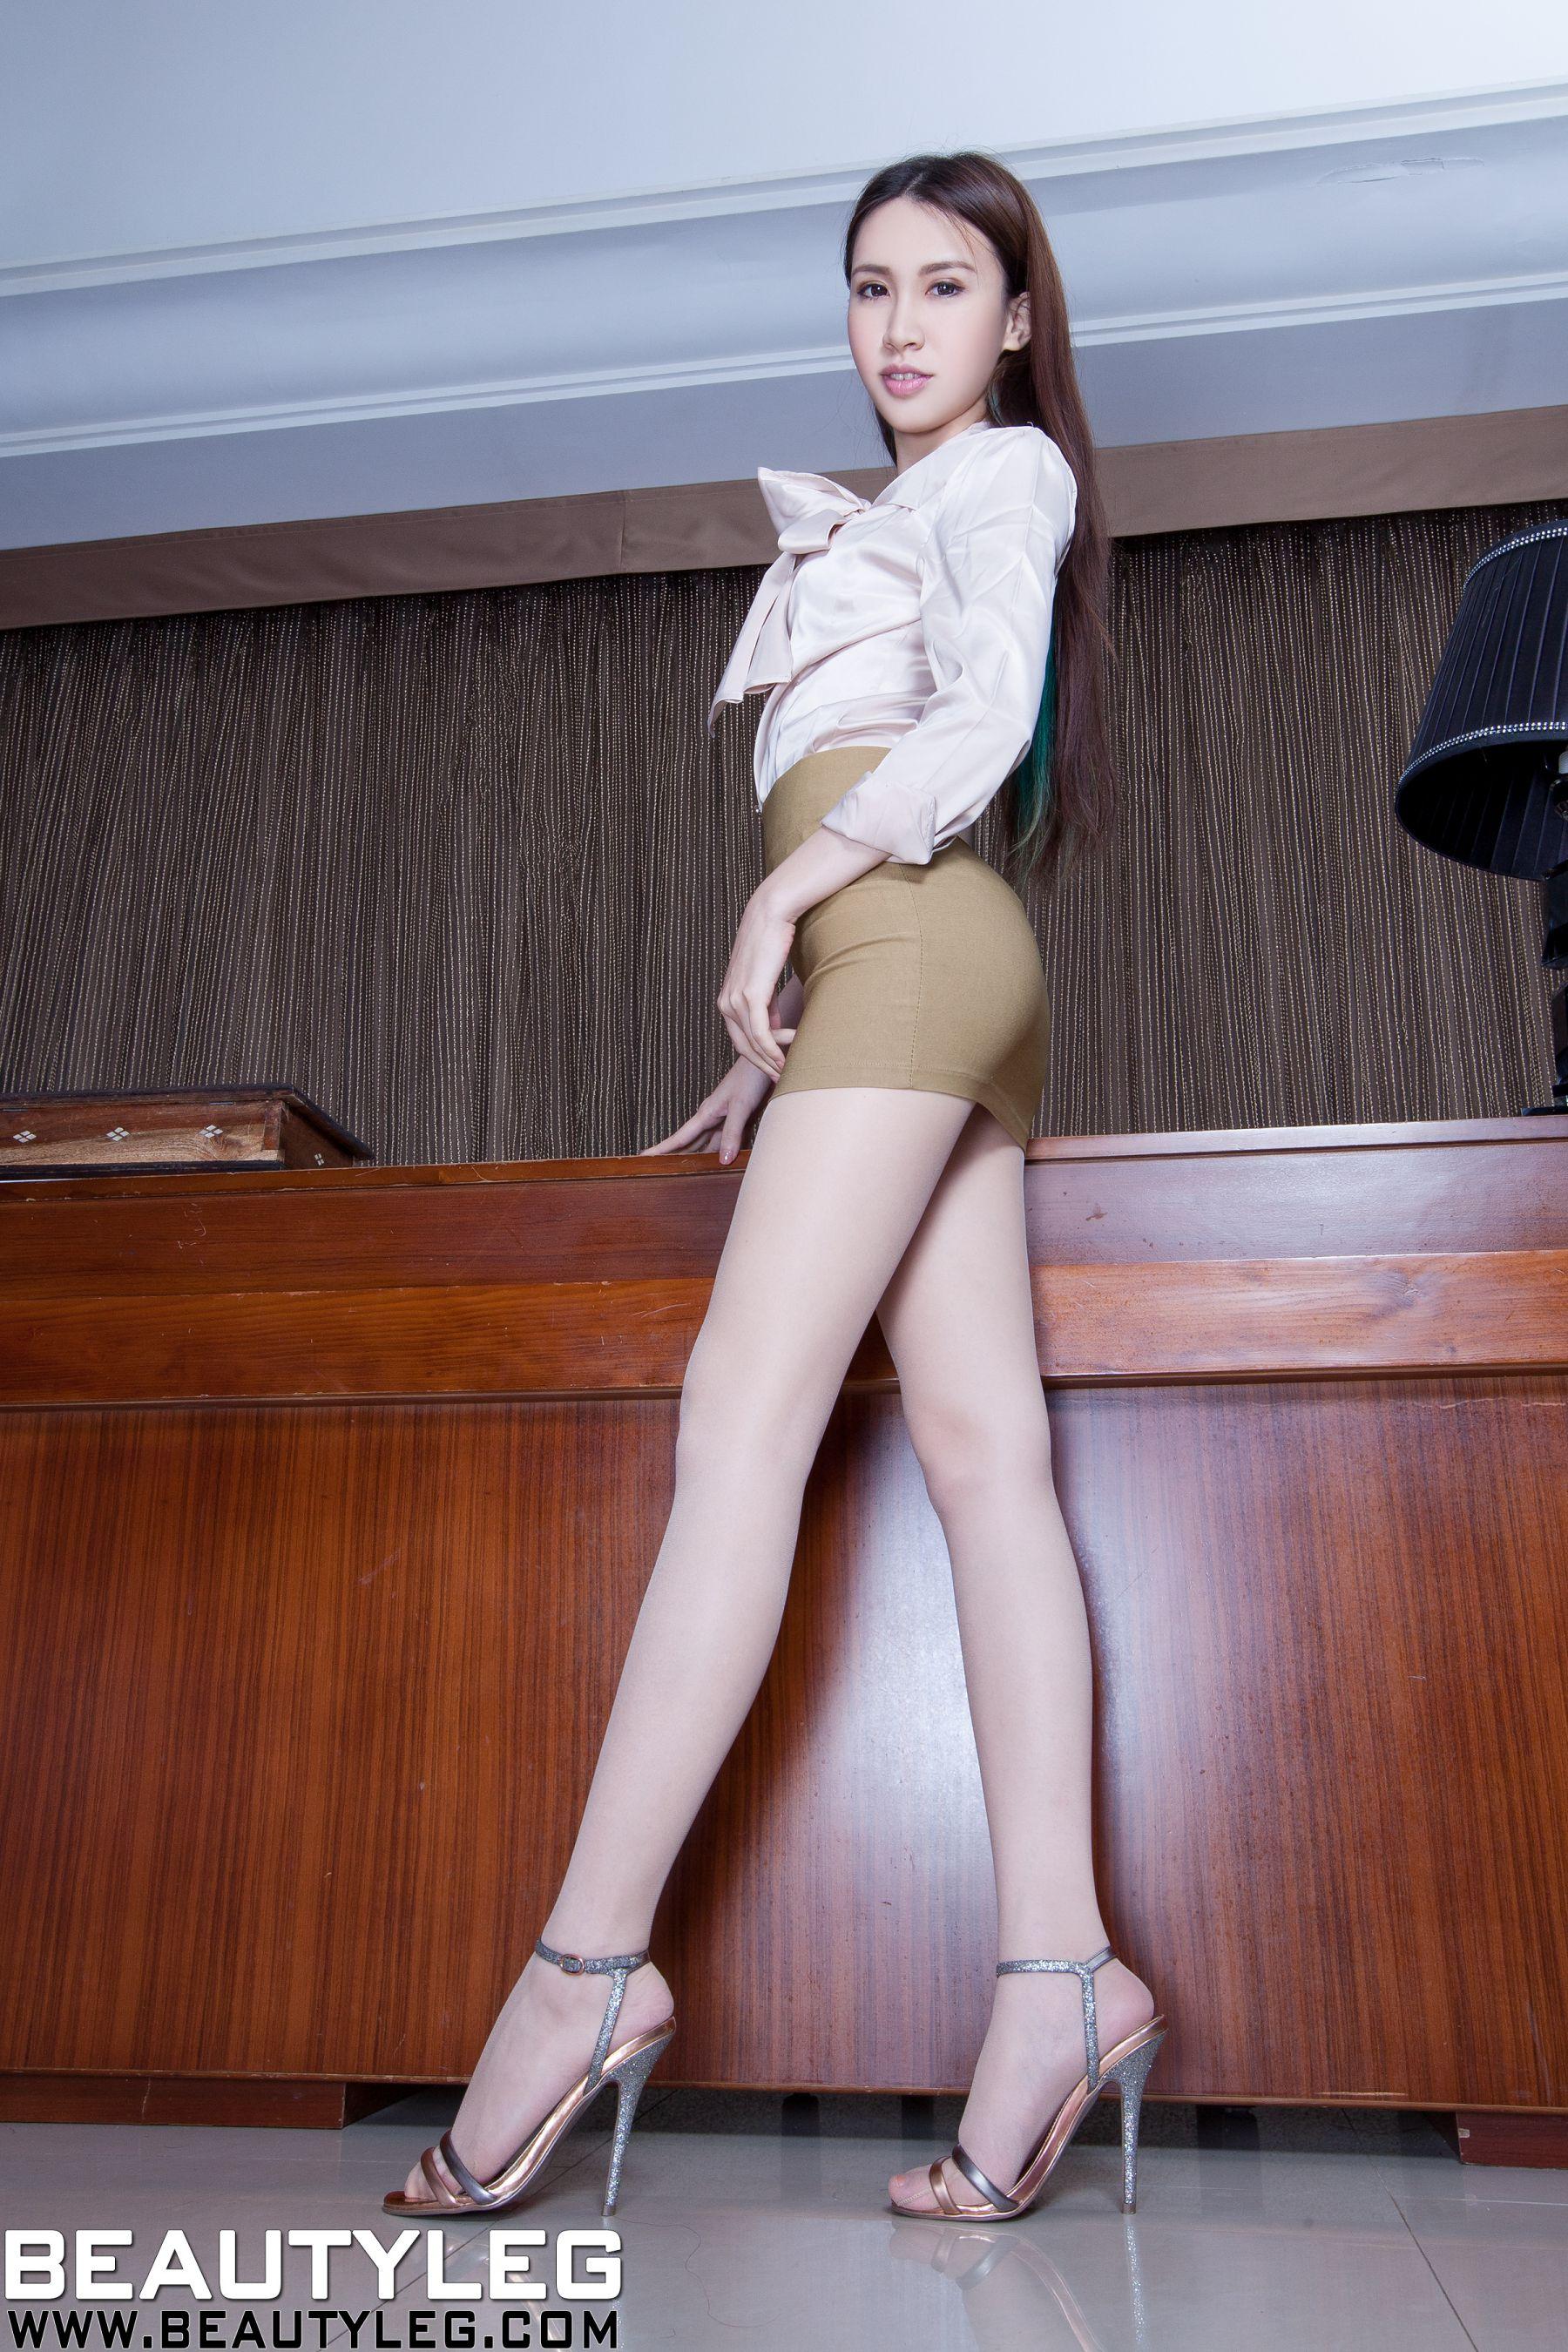 VOL.645 [Beautyleg]美腿吊带丝袜:崔多朵(崔德蓉,腿模Stephy)高品质写真套图(60P)